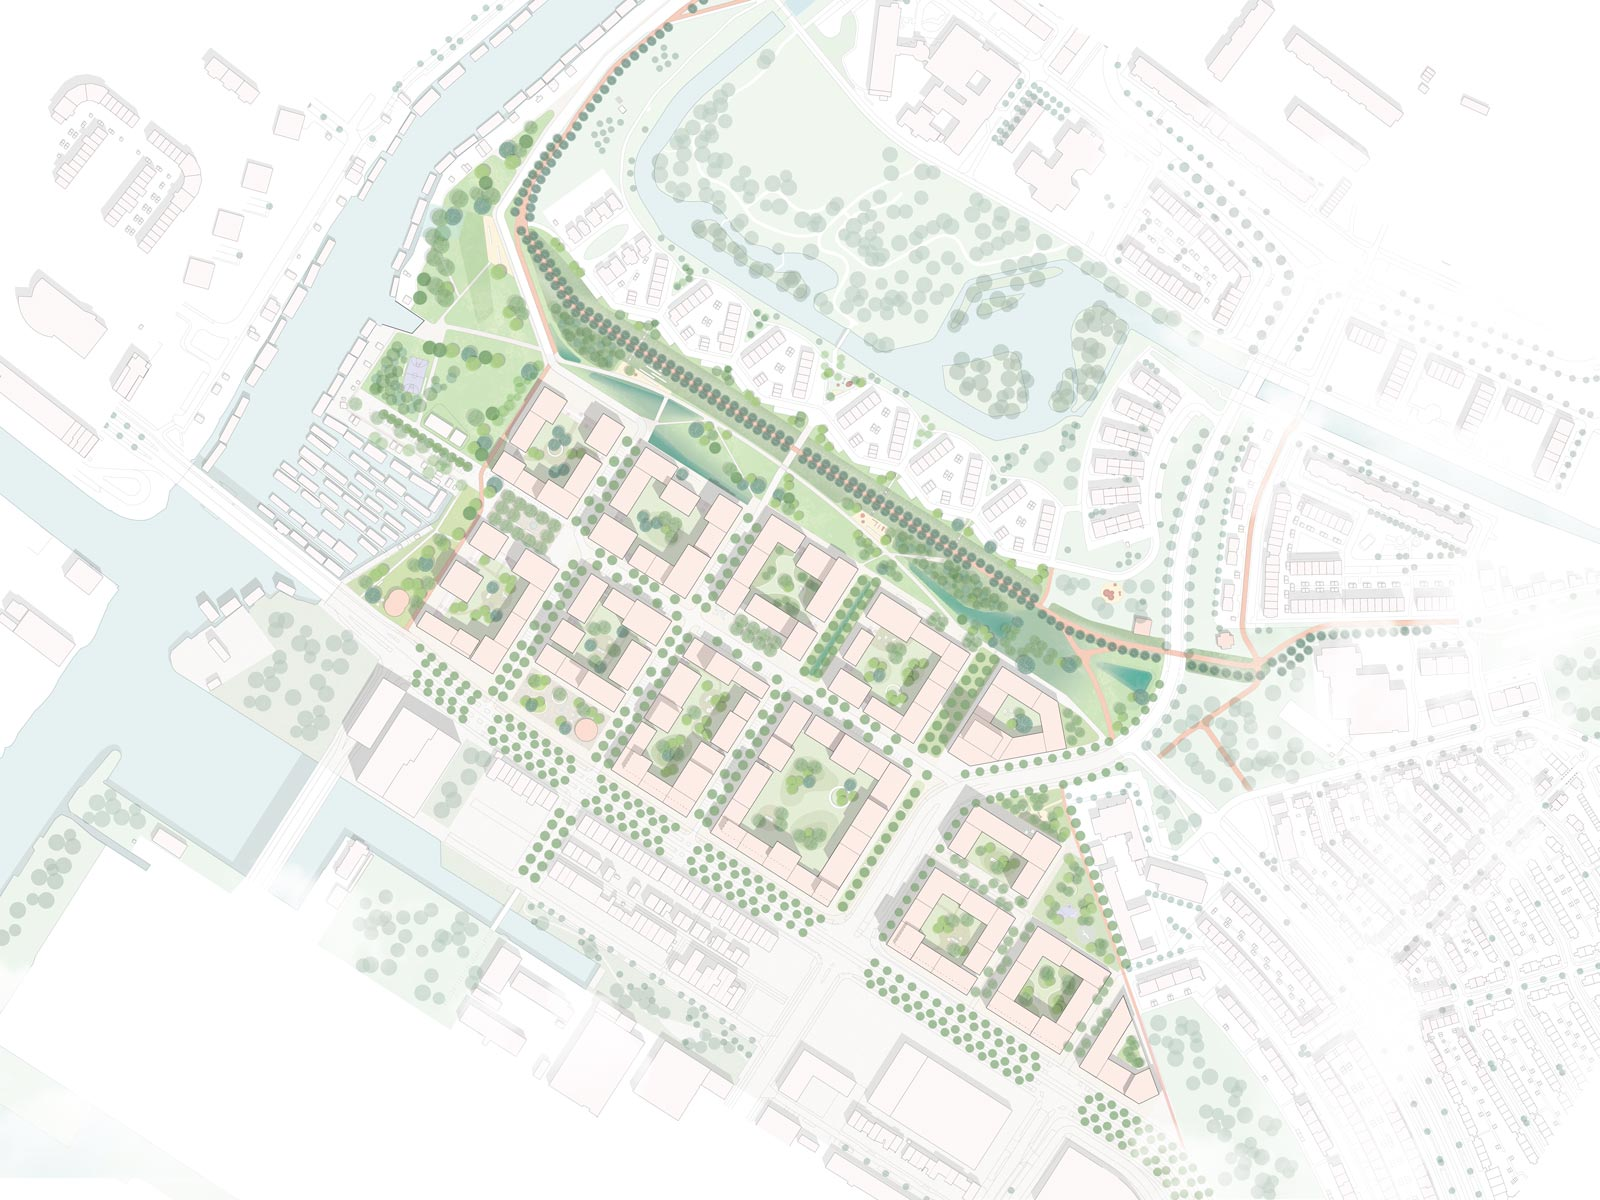 2d plan view of project Klaprozenbuurt masterplan by BETA architect Amsterdam